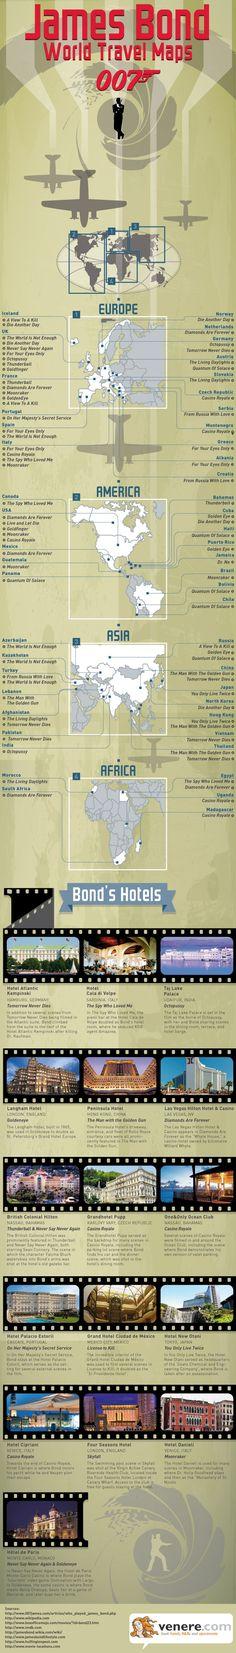 My name is Bond. — mapsontheweb: James Bond World Travel Maps James Bond Movie Posters, James Bond Movies, Casino Royale, James Bond Party, Bond Cars, Star Wars, Sean Connery, Travel Maps, Arrow